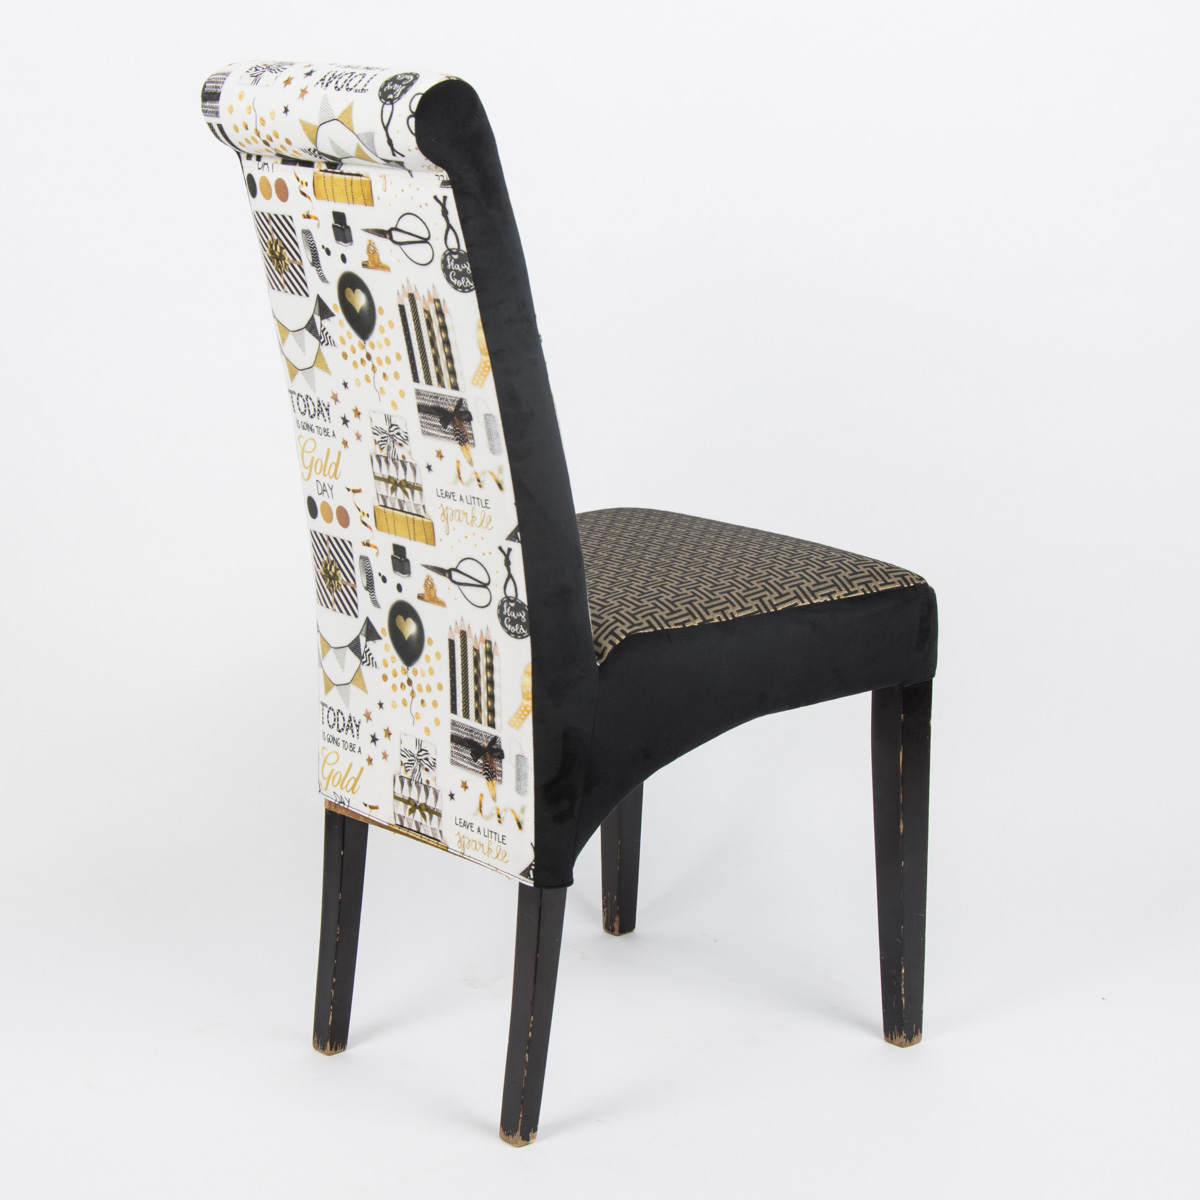 bezugsstoff polsterstoff samtstoff samt schwarz stoffe wohnstoffe m belstoffe. Black Bedroom Furniture Sets. Home Design Ideas